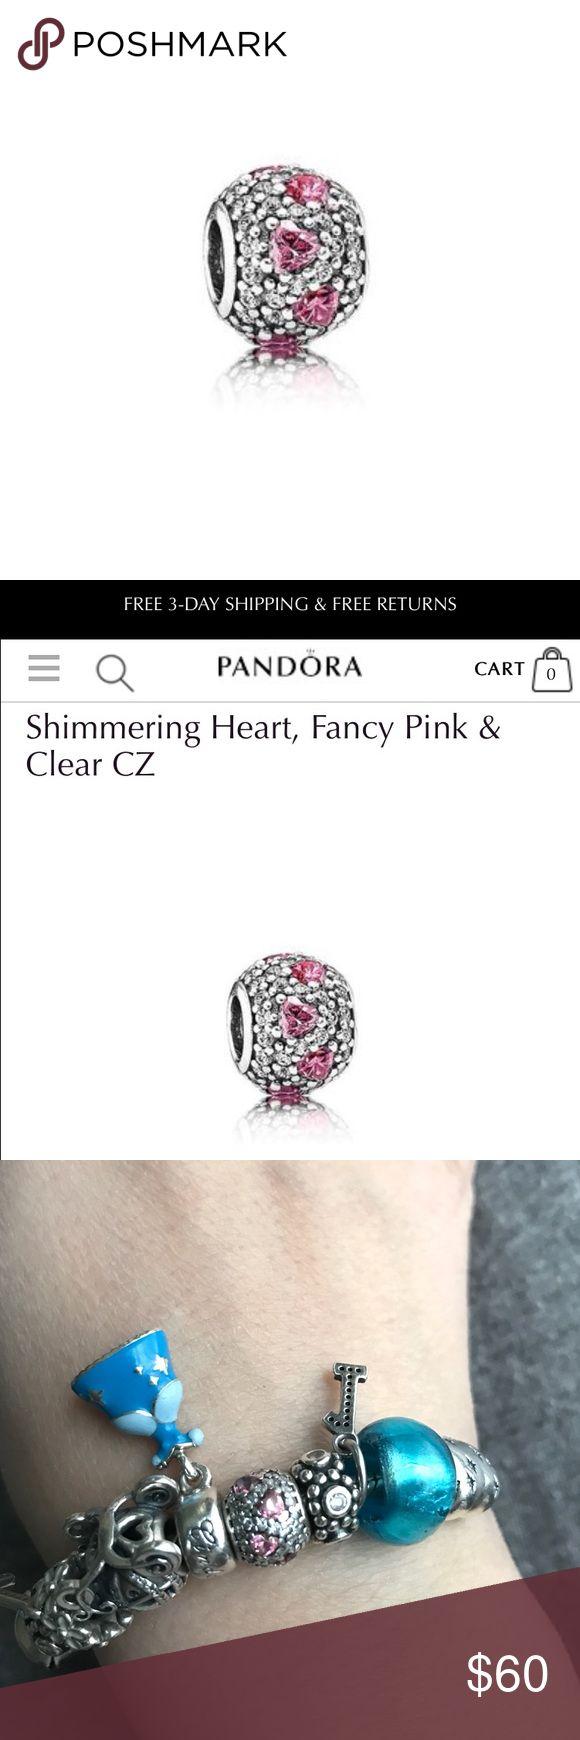 Pink Crystal Heart Pandora Charm Pink Crystal Heart Pandora Official Charm. Pandora Jewelry Bracelets